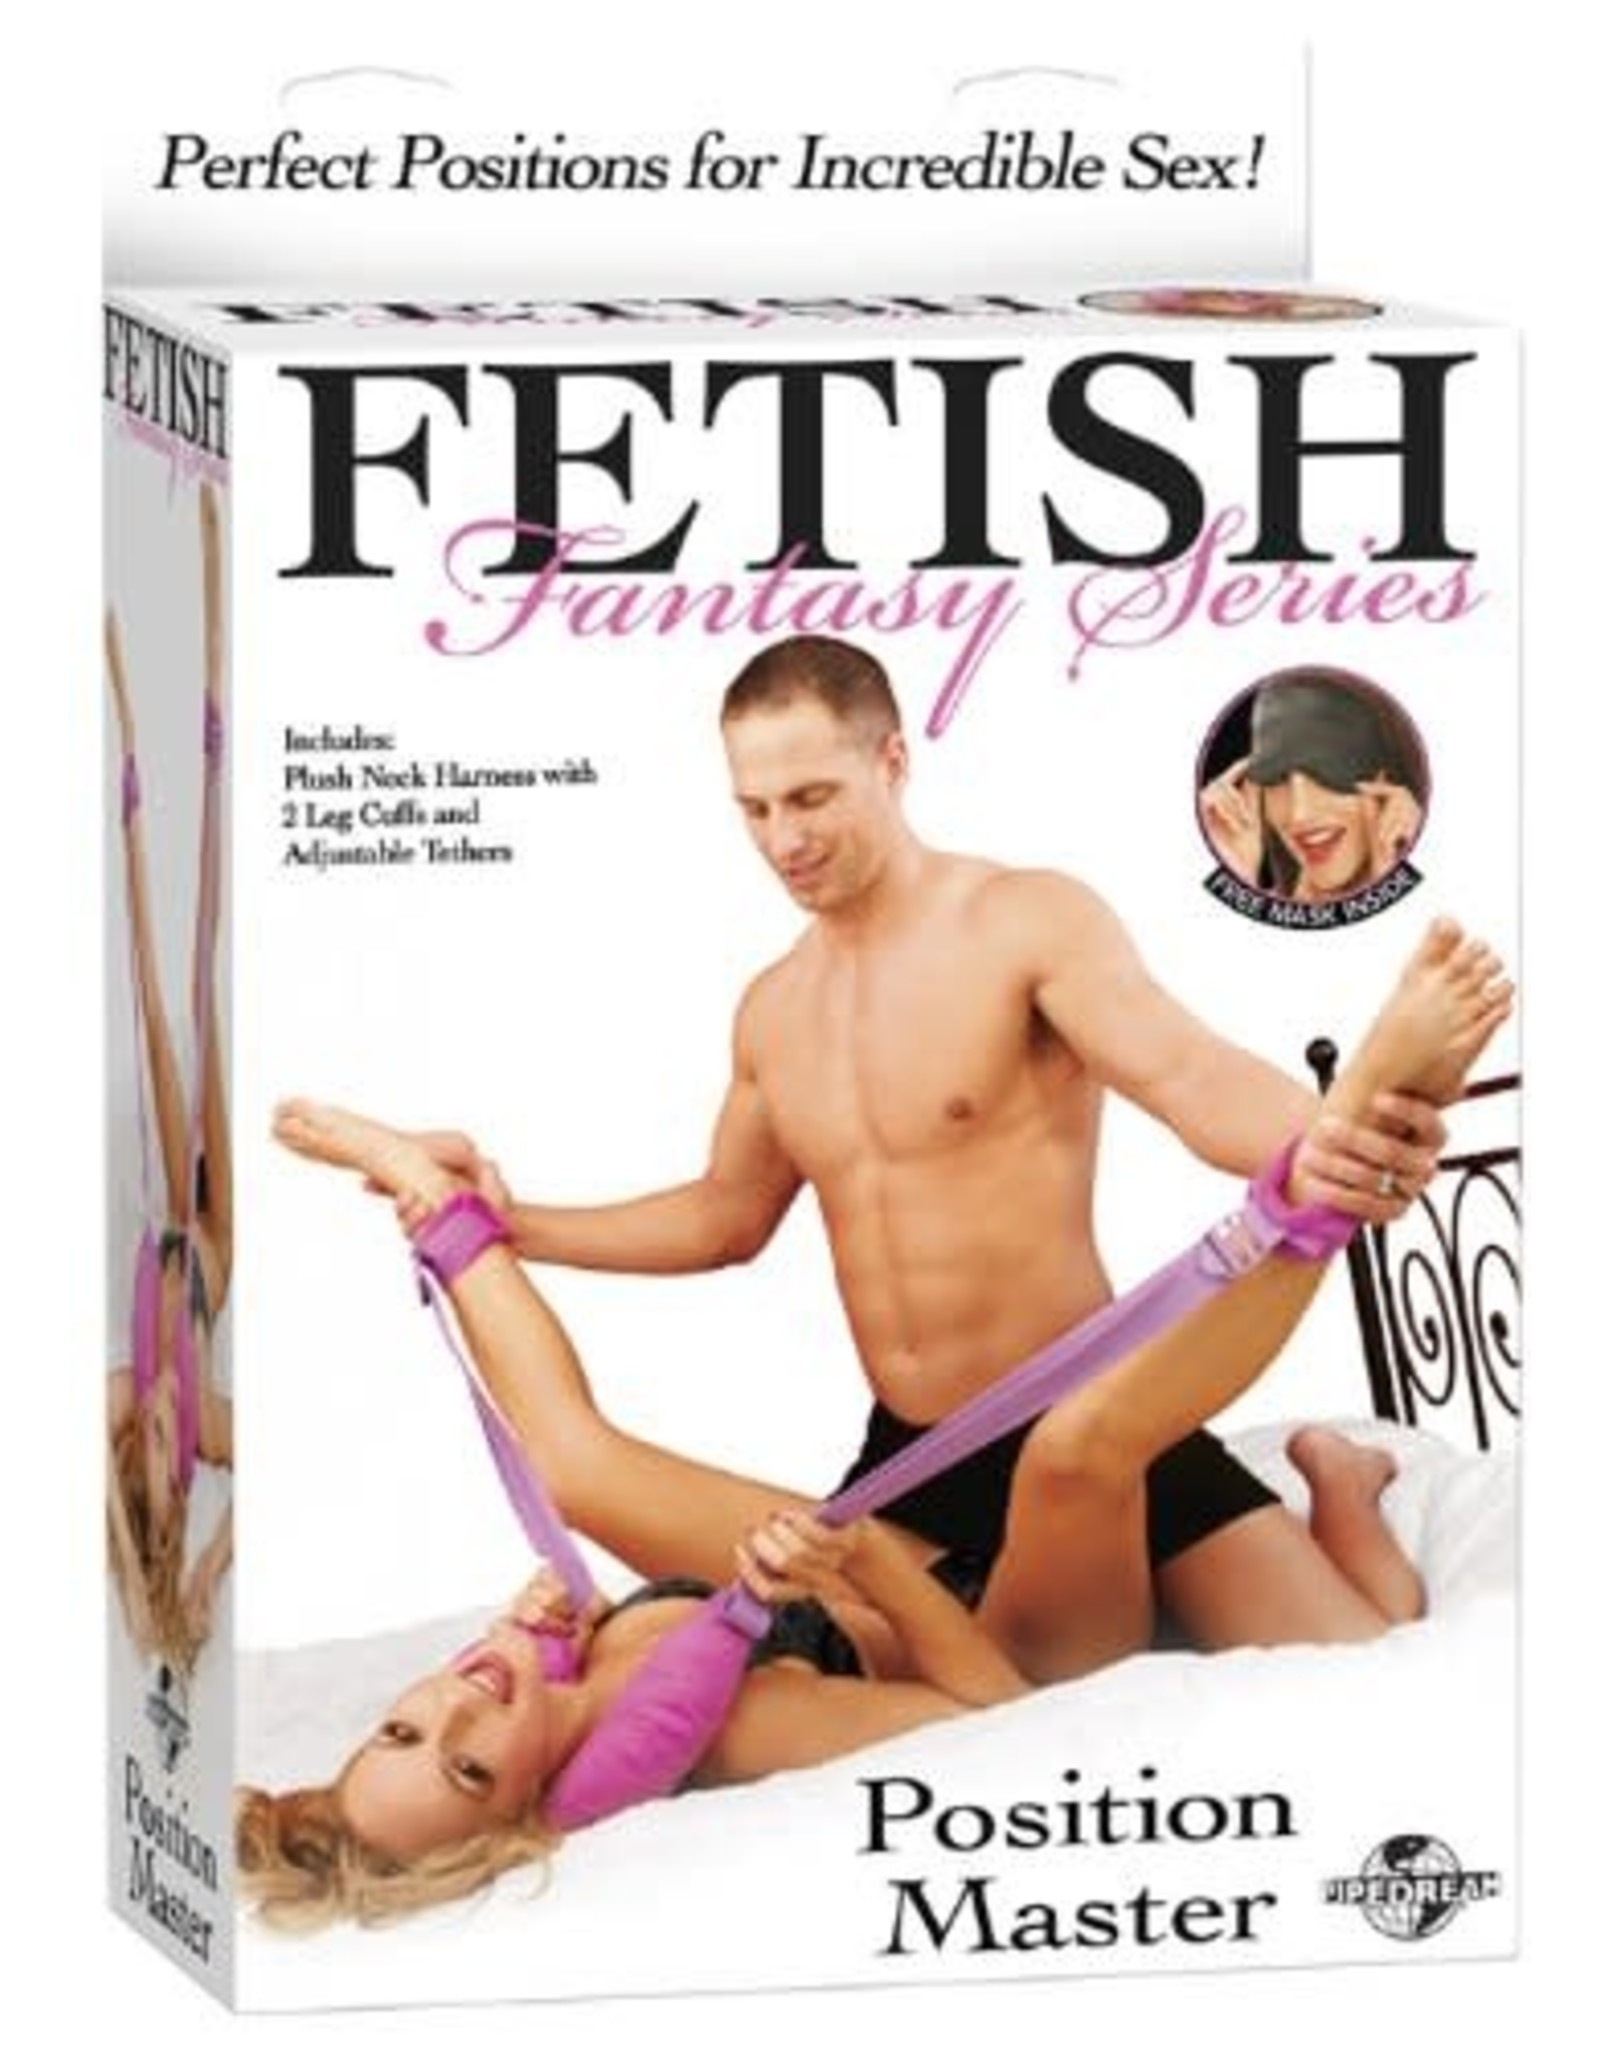 FETISH FANTASY POSITION MASTER SET